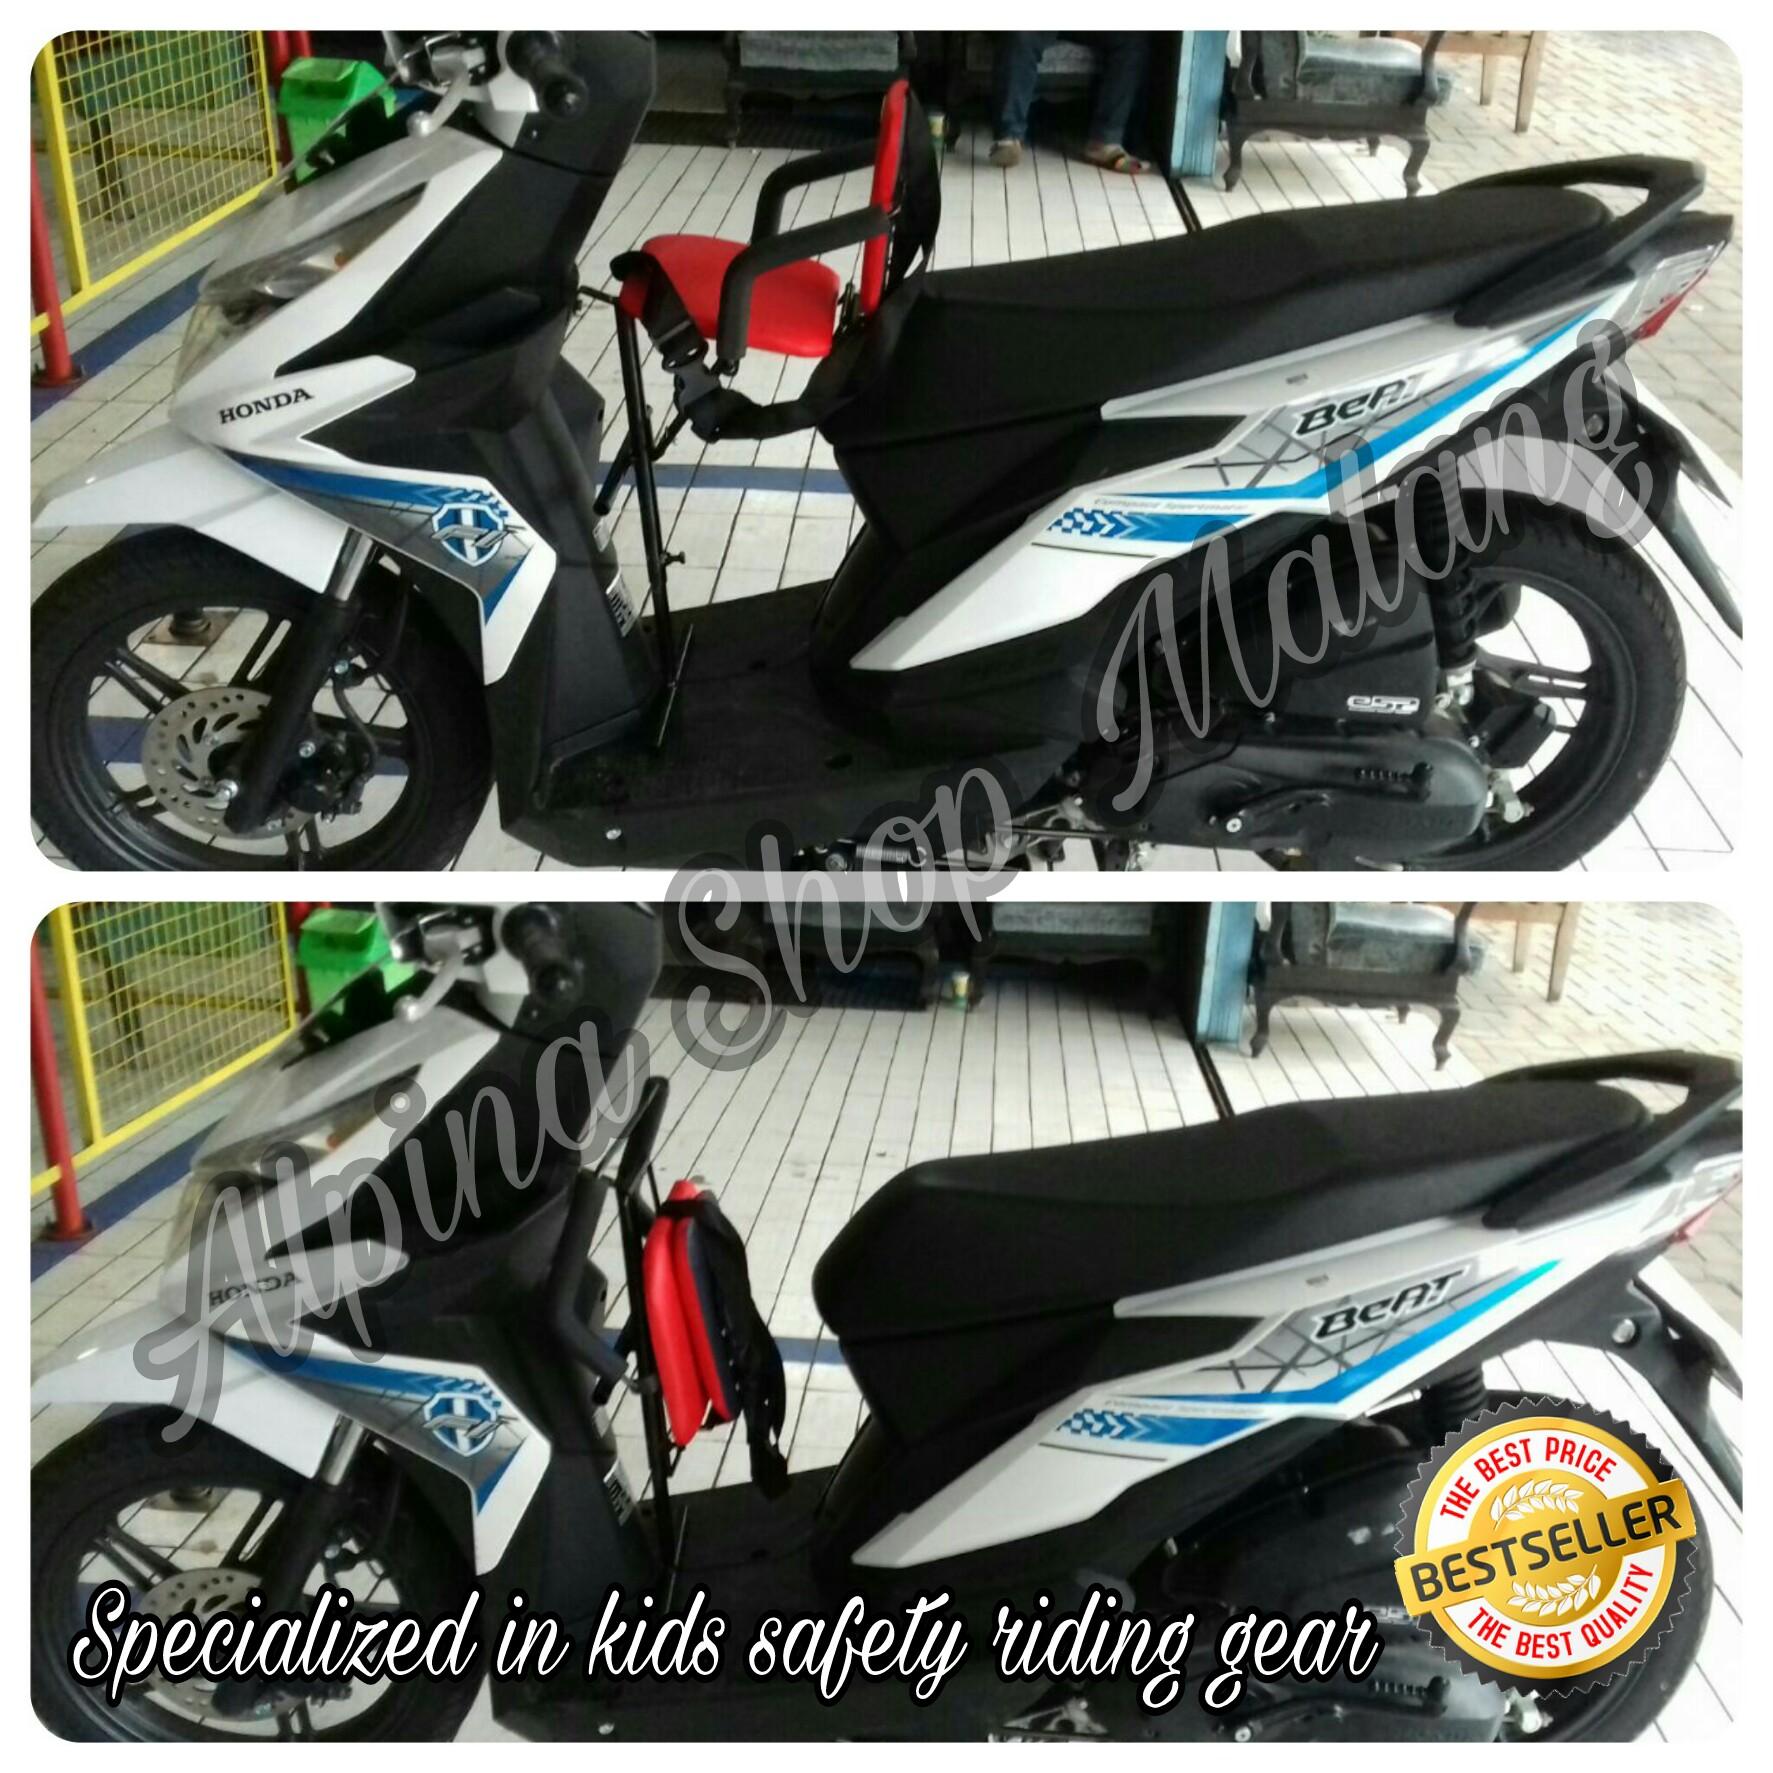 Jual Kursi Bonceng Boncengan Anak Alpina Matic Shop New Sepeda Depan Malang Tokopedia